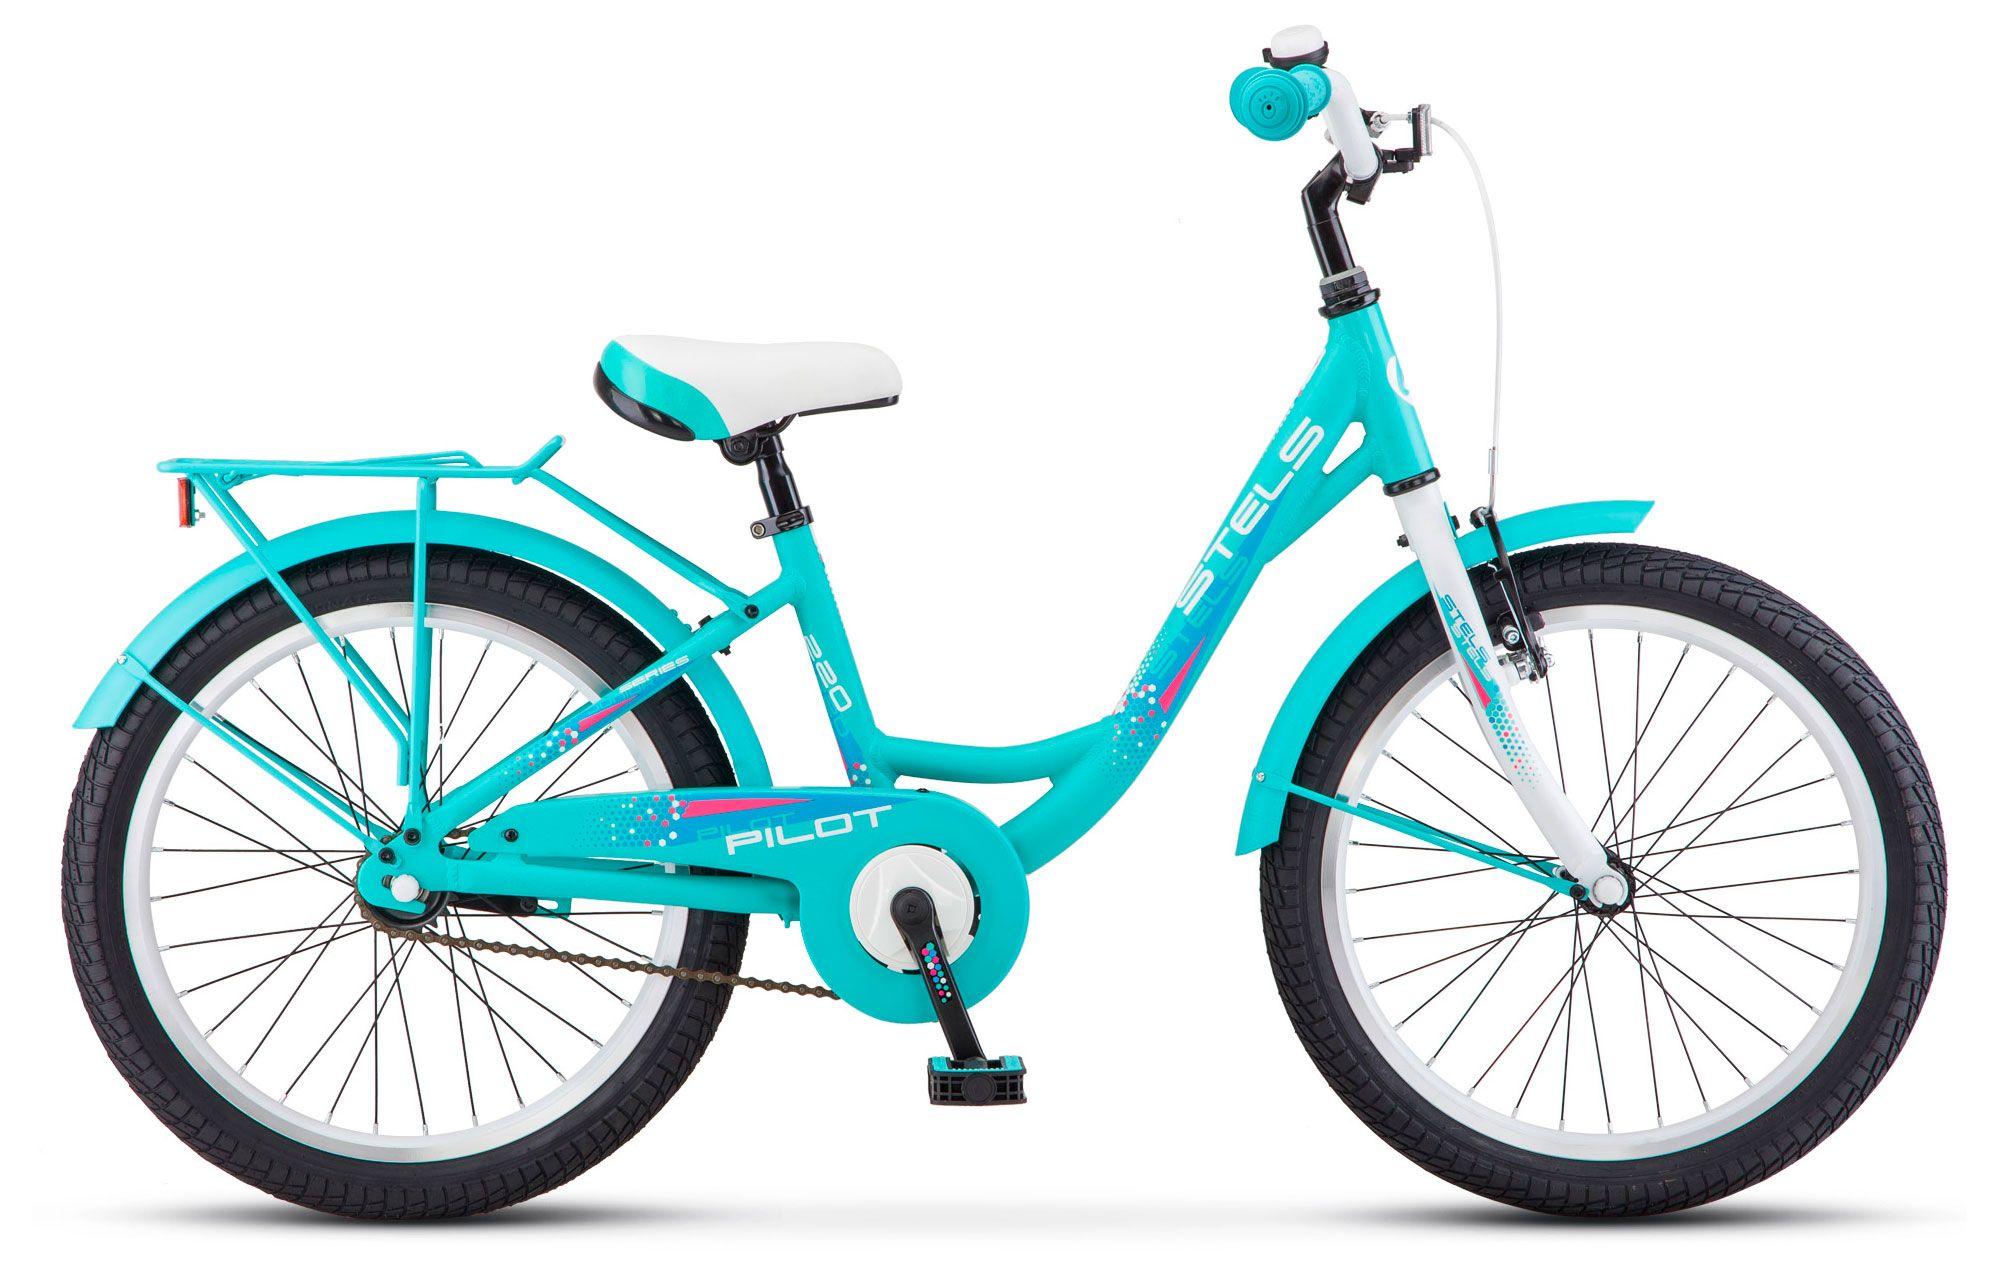 Велосипед Stels Pilot 220 Lady 20 (V010) 2018